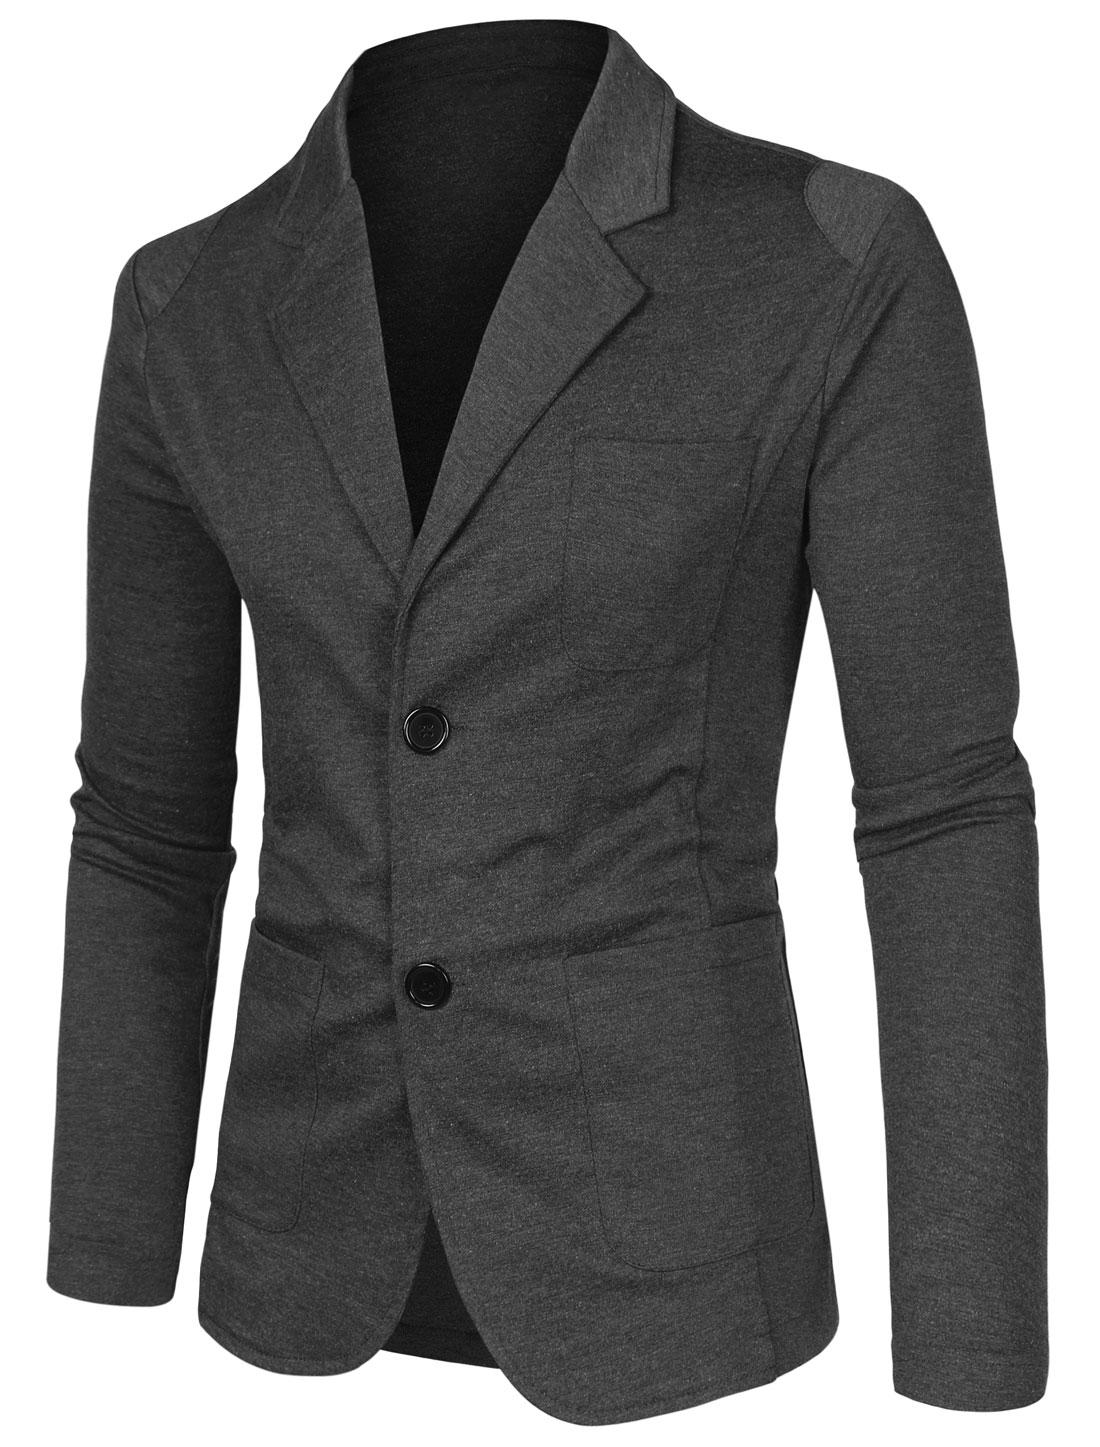 Men Notched Lapel Solid Color Long Sleeve Knit Blazer Dark Gray 36